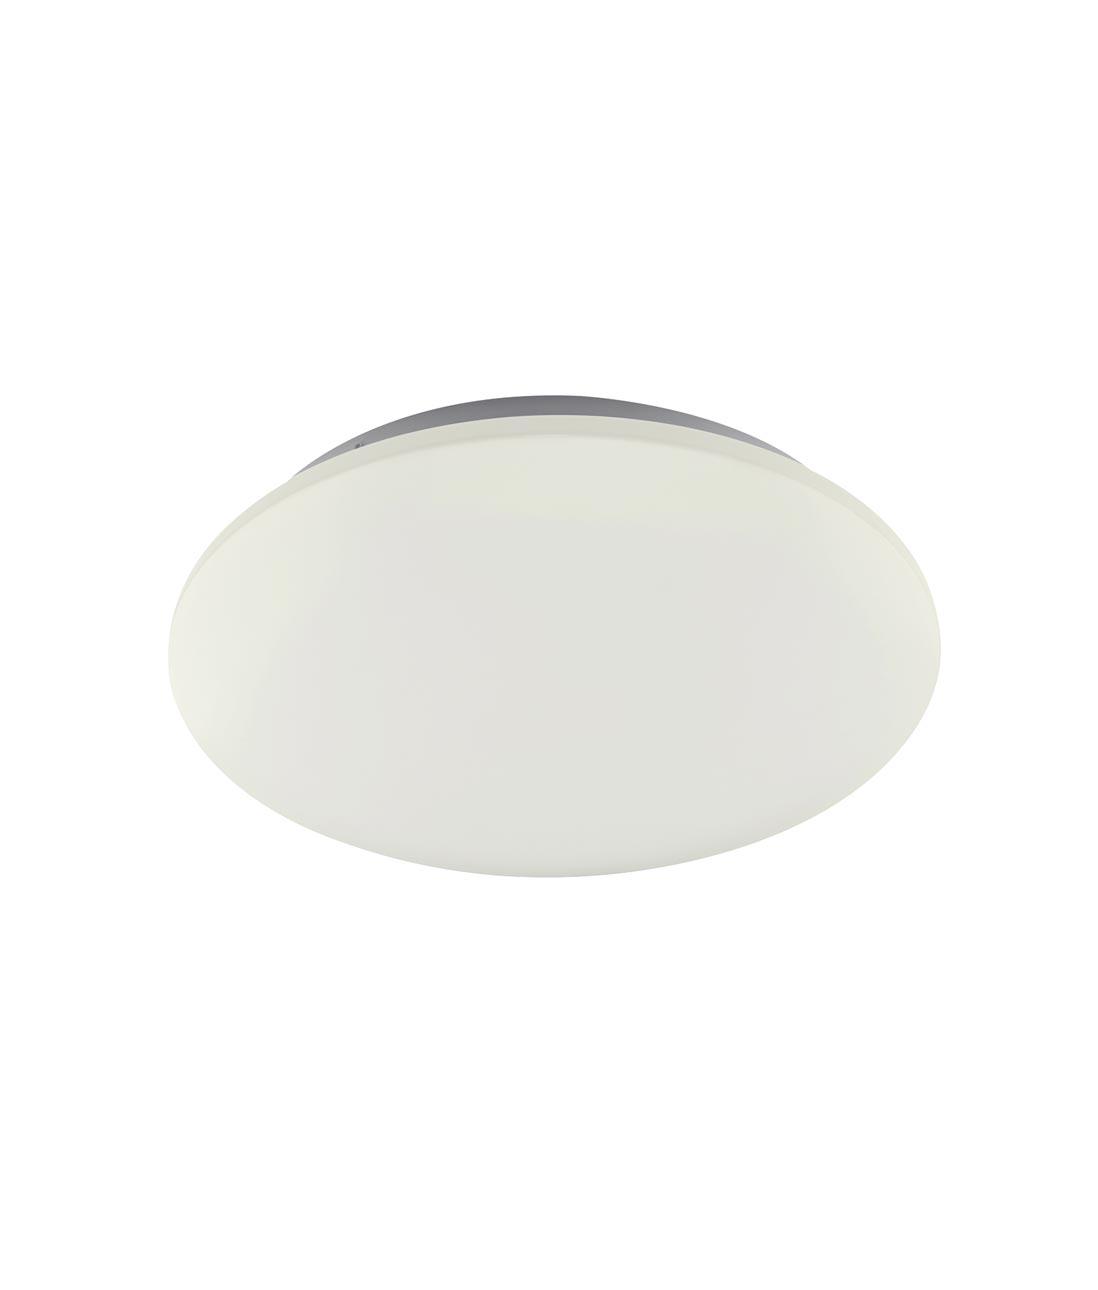 Plafón mediano luz cálida LED ZERO II